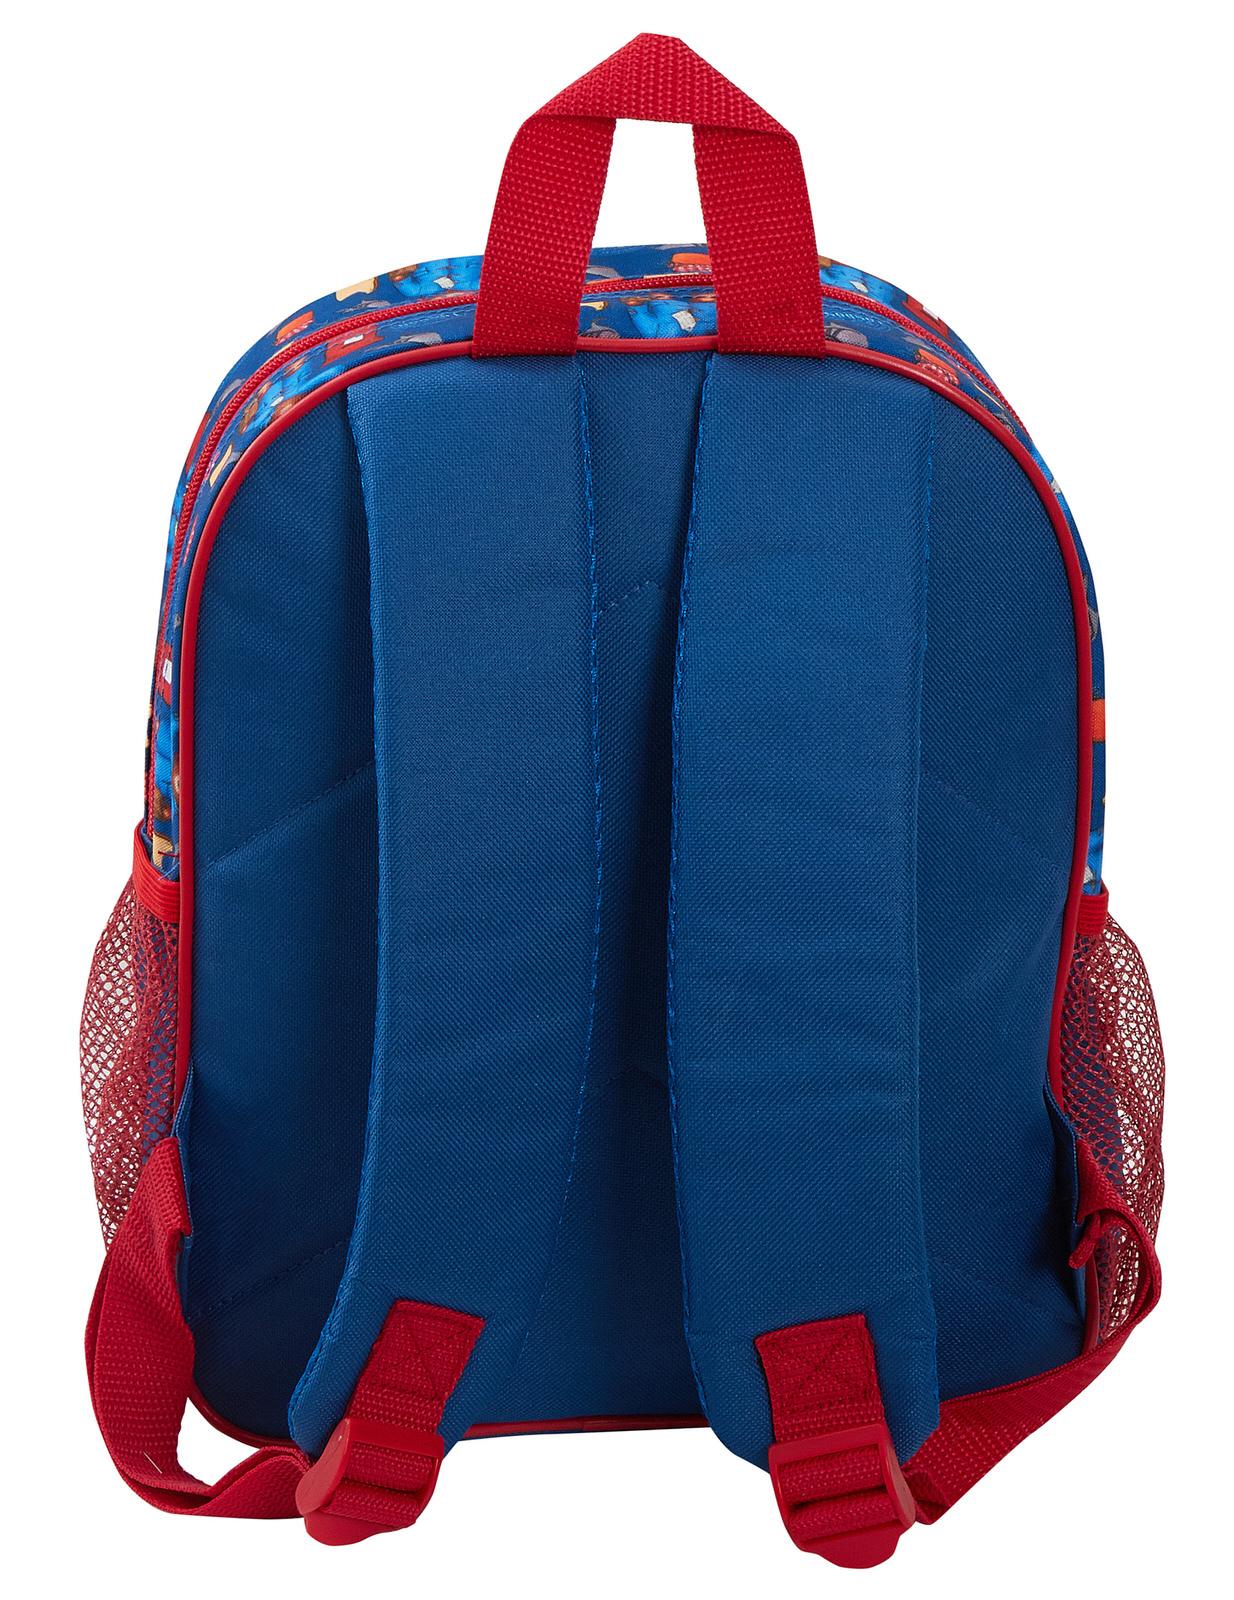 miniatuur 17 - Paddington Bear Kids Backpack + Detachable Lunch Bag/Pencil Case Nursery School